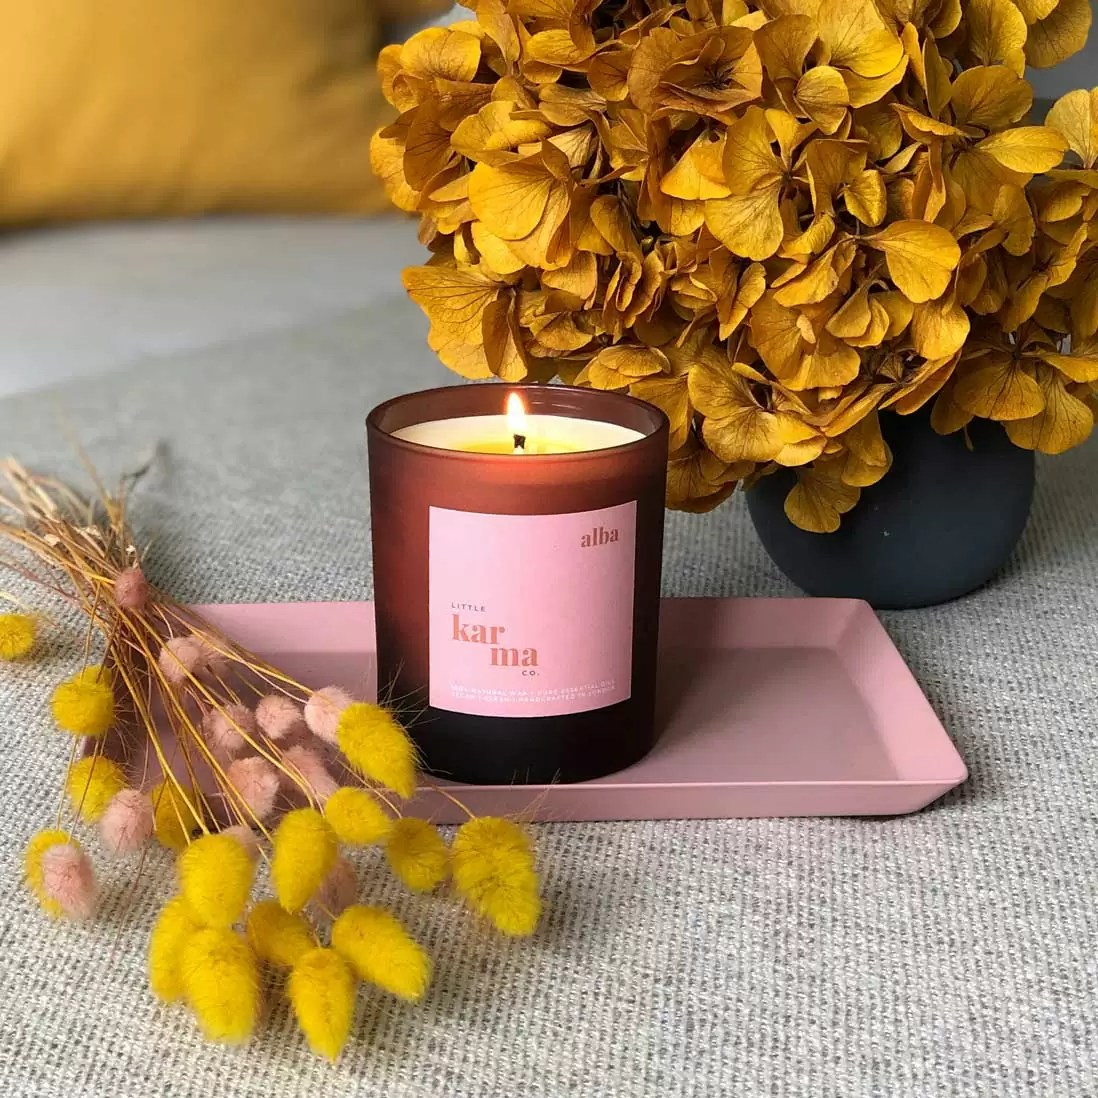 alba | balancing bergamot + rose geranium refillable large candle [220g]